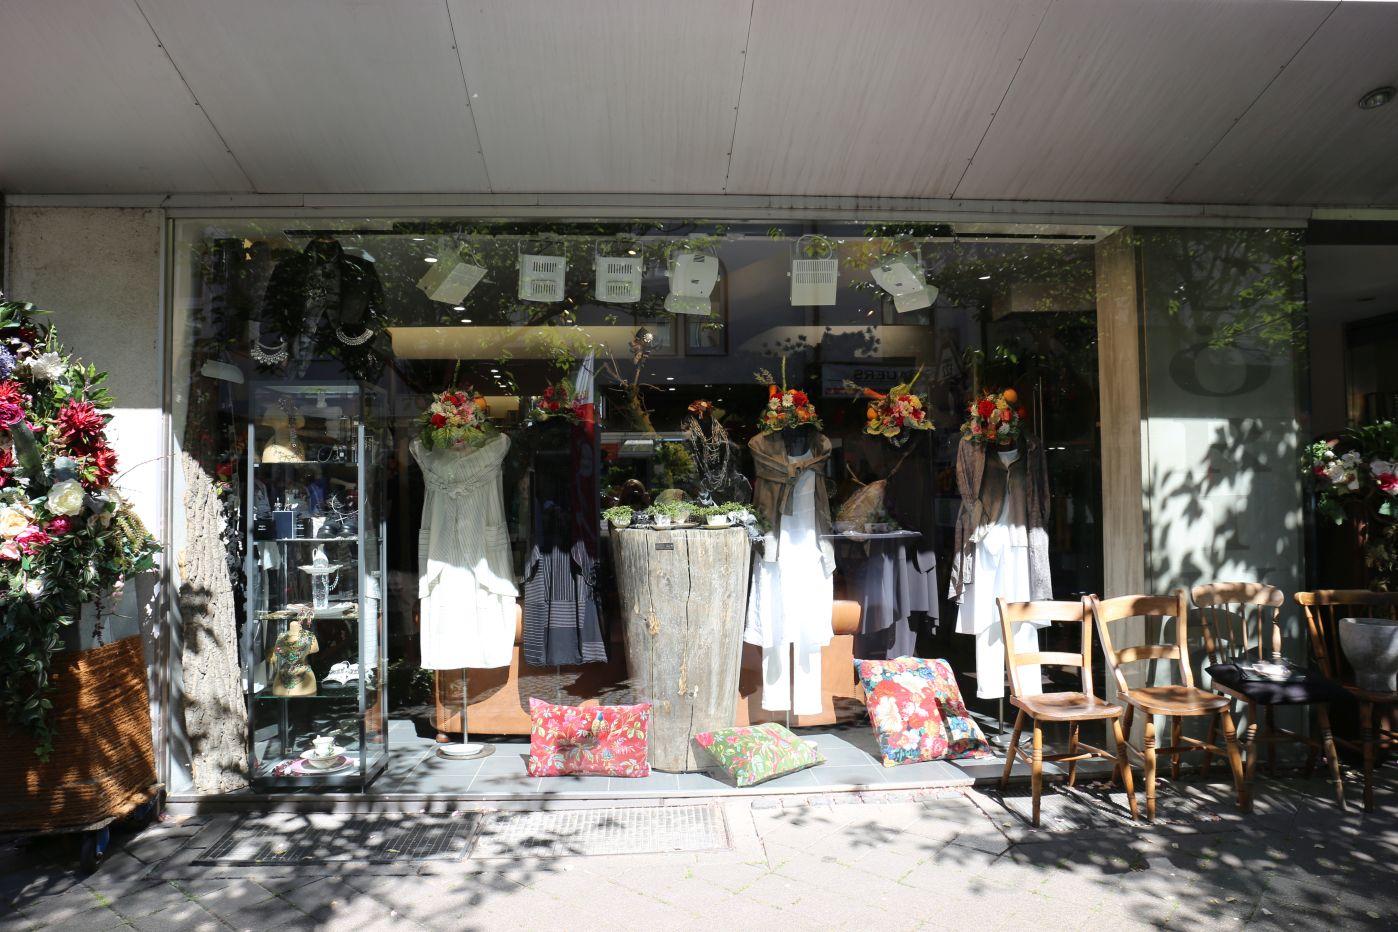 Doering boutique(31)